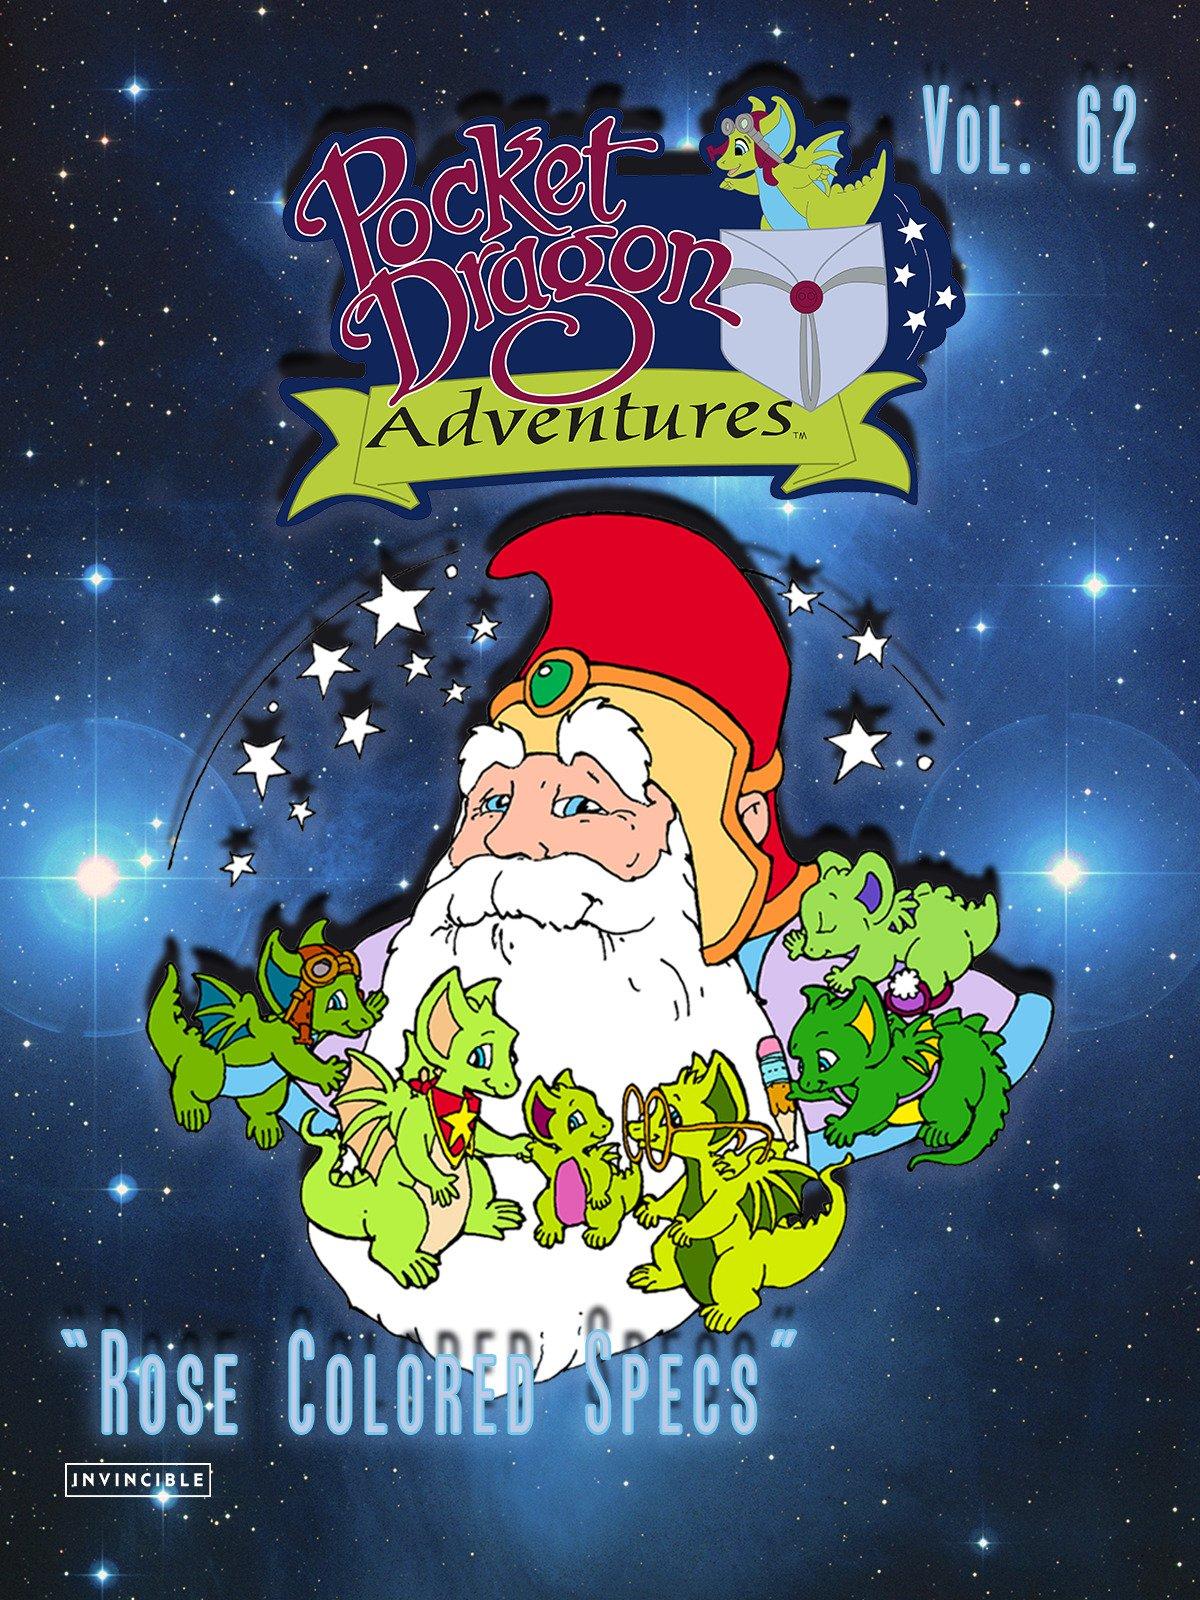 Pocket Dragon Adventures Vol. 62Rose Colored Specs